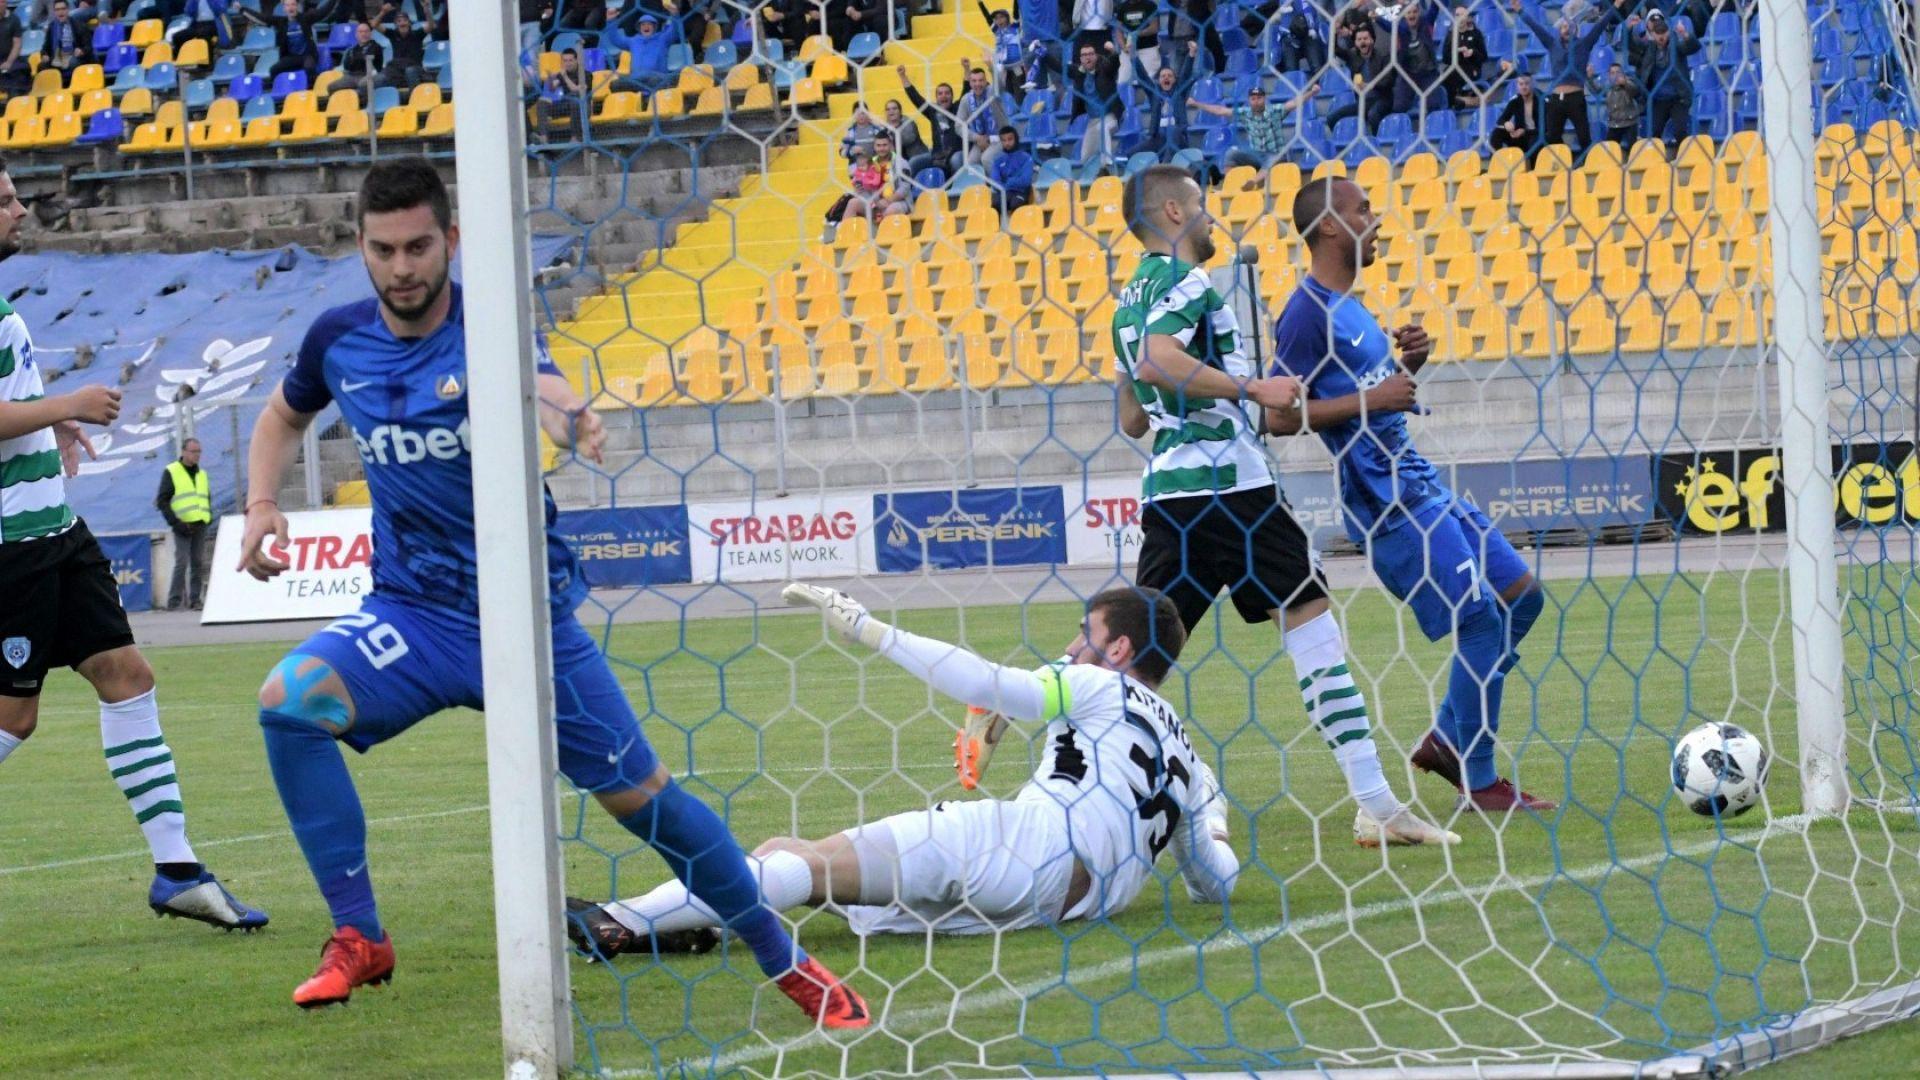 Левски задържа основния си голмайстор с нов договор за още 2 сезона